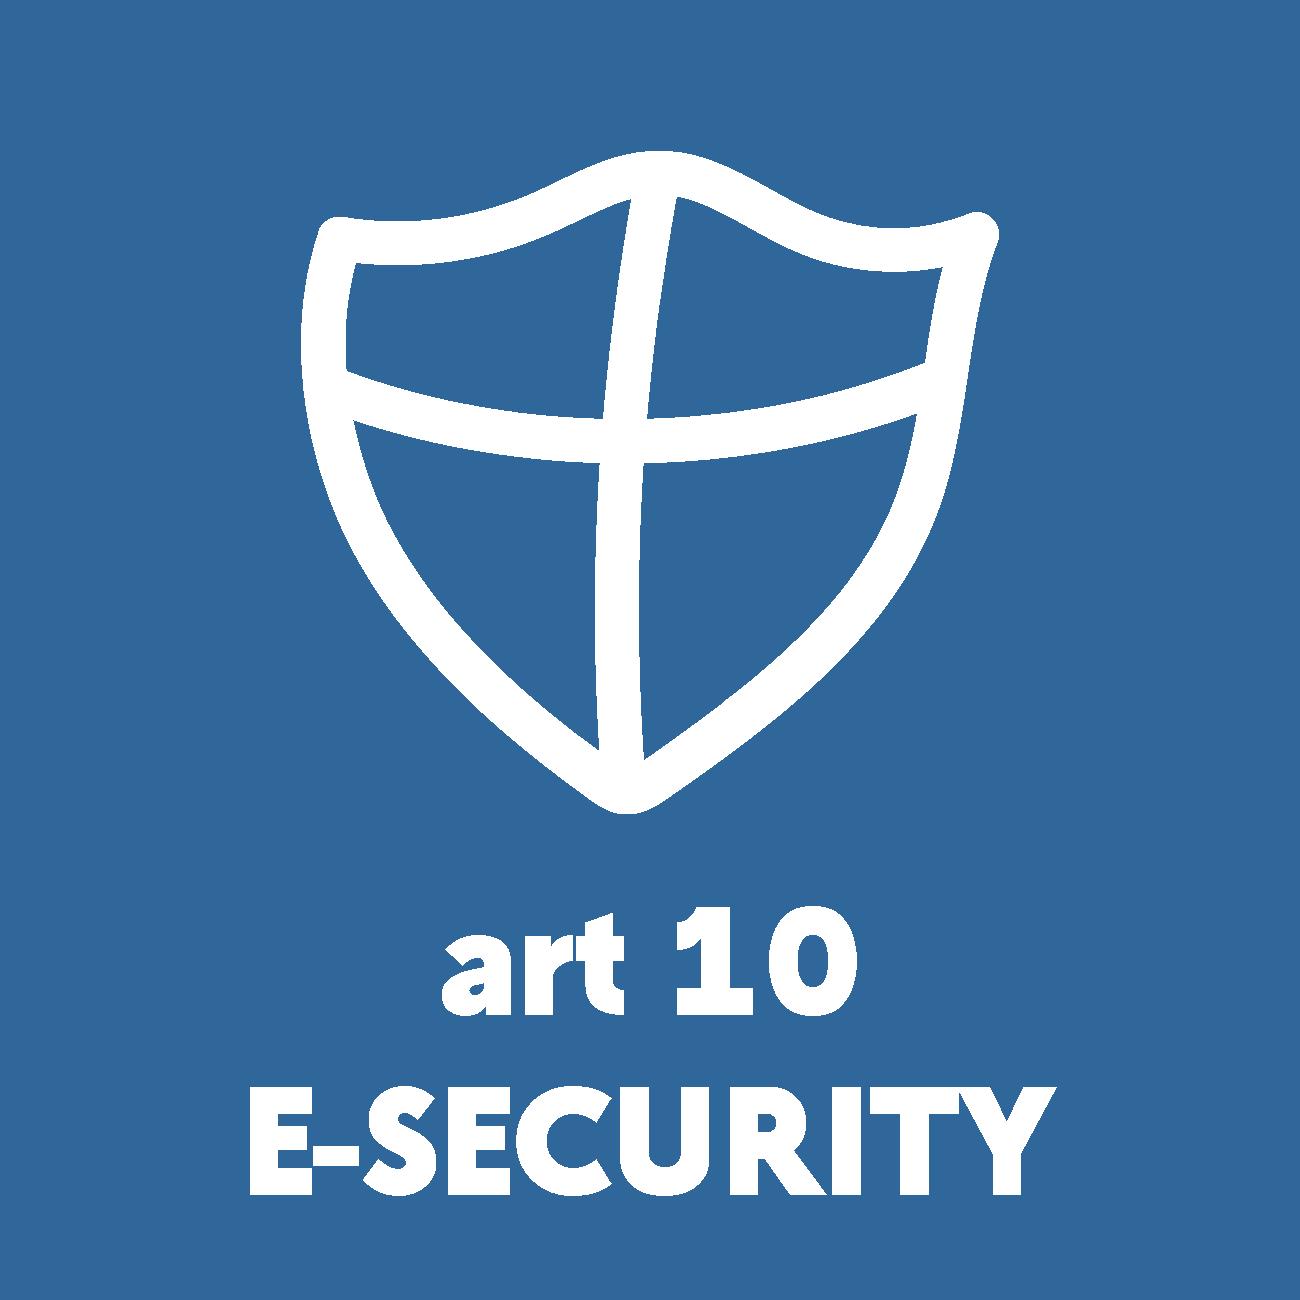 Art 10 e-security